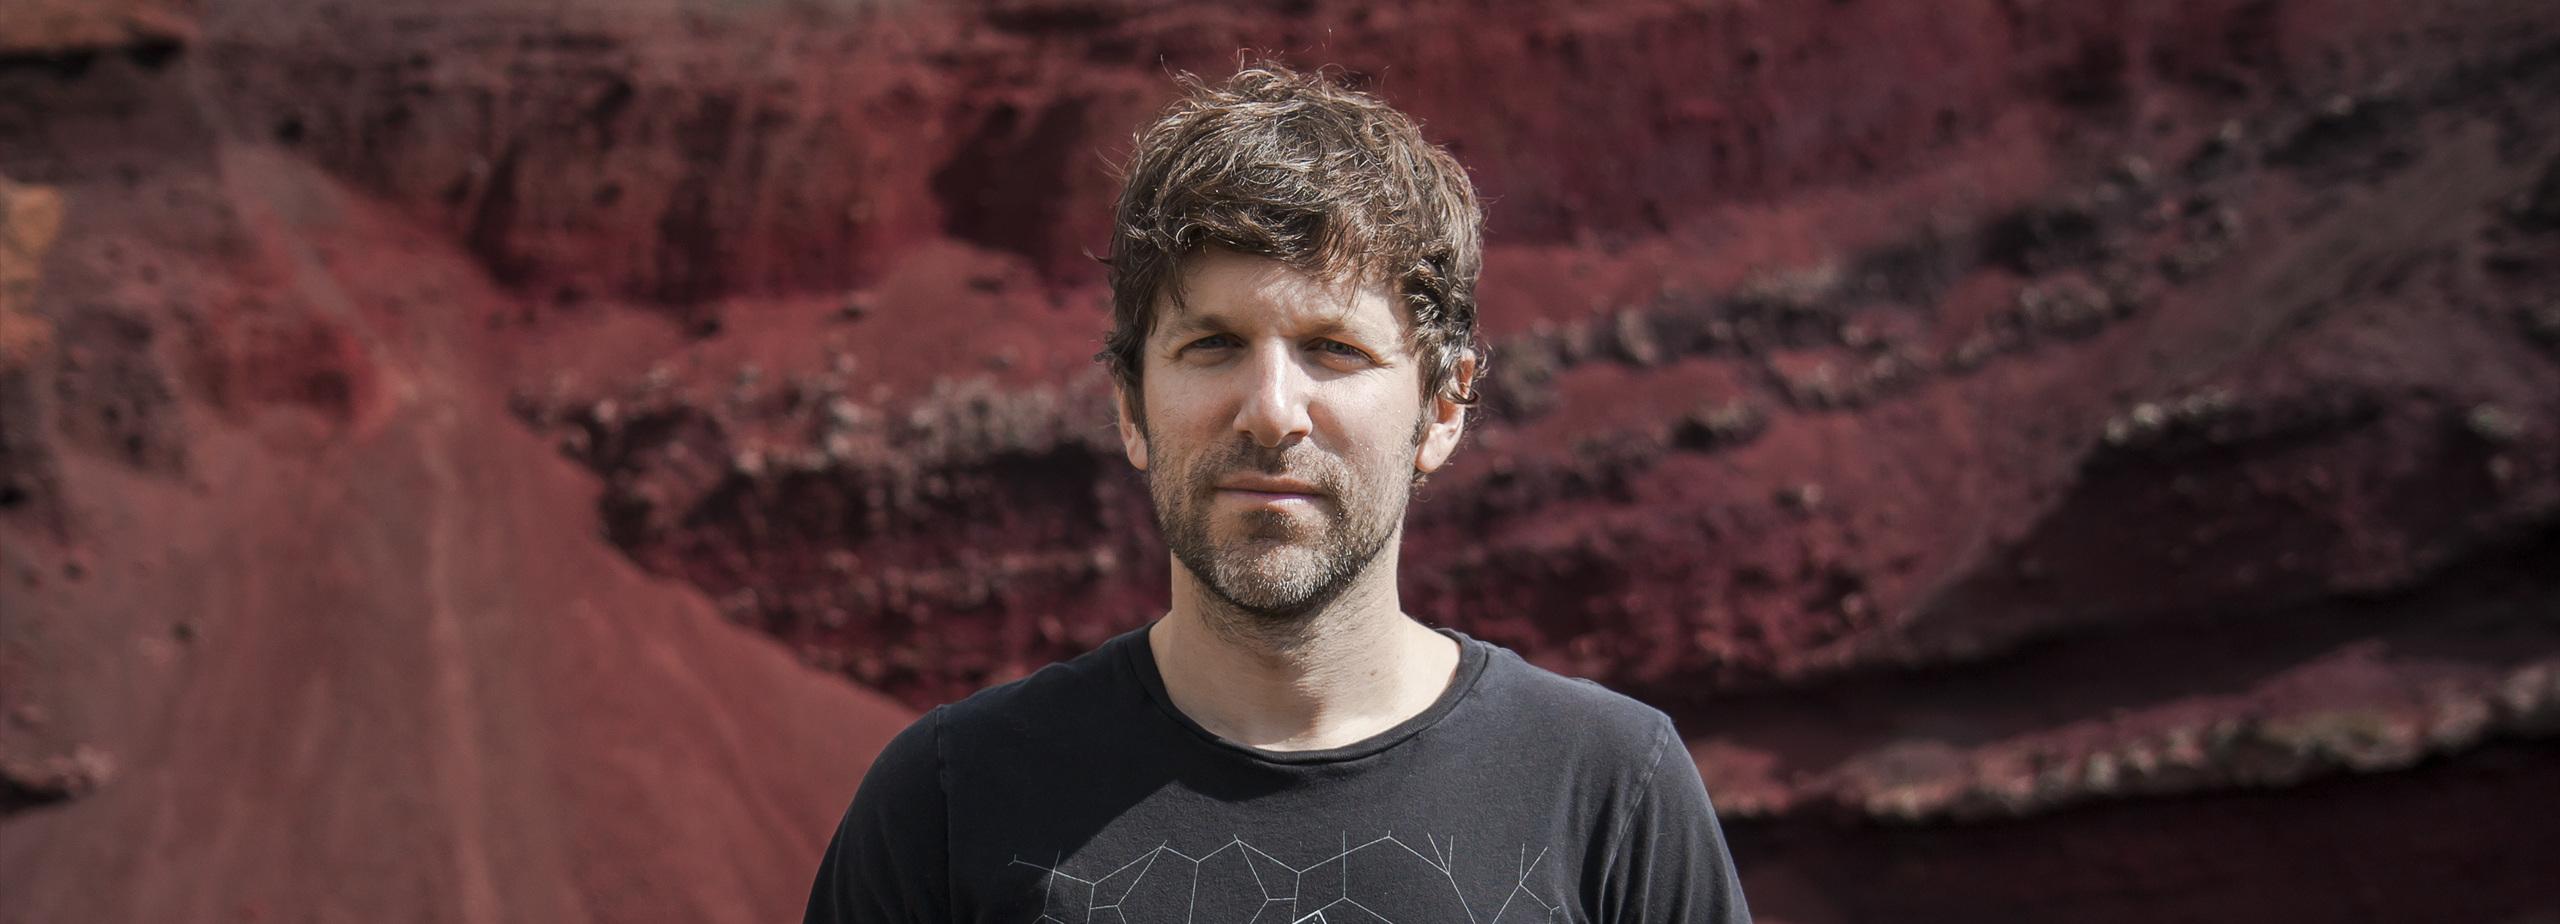 Bradley Grosh Munkowitz